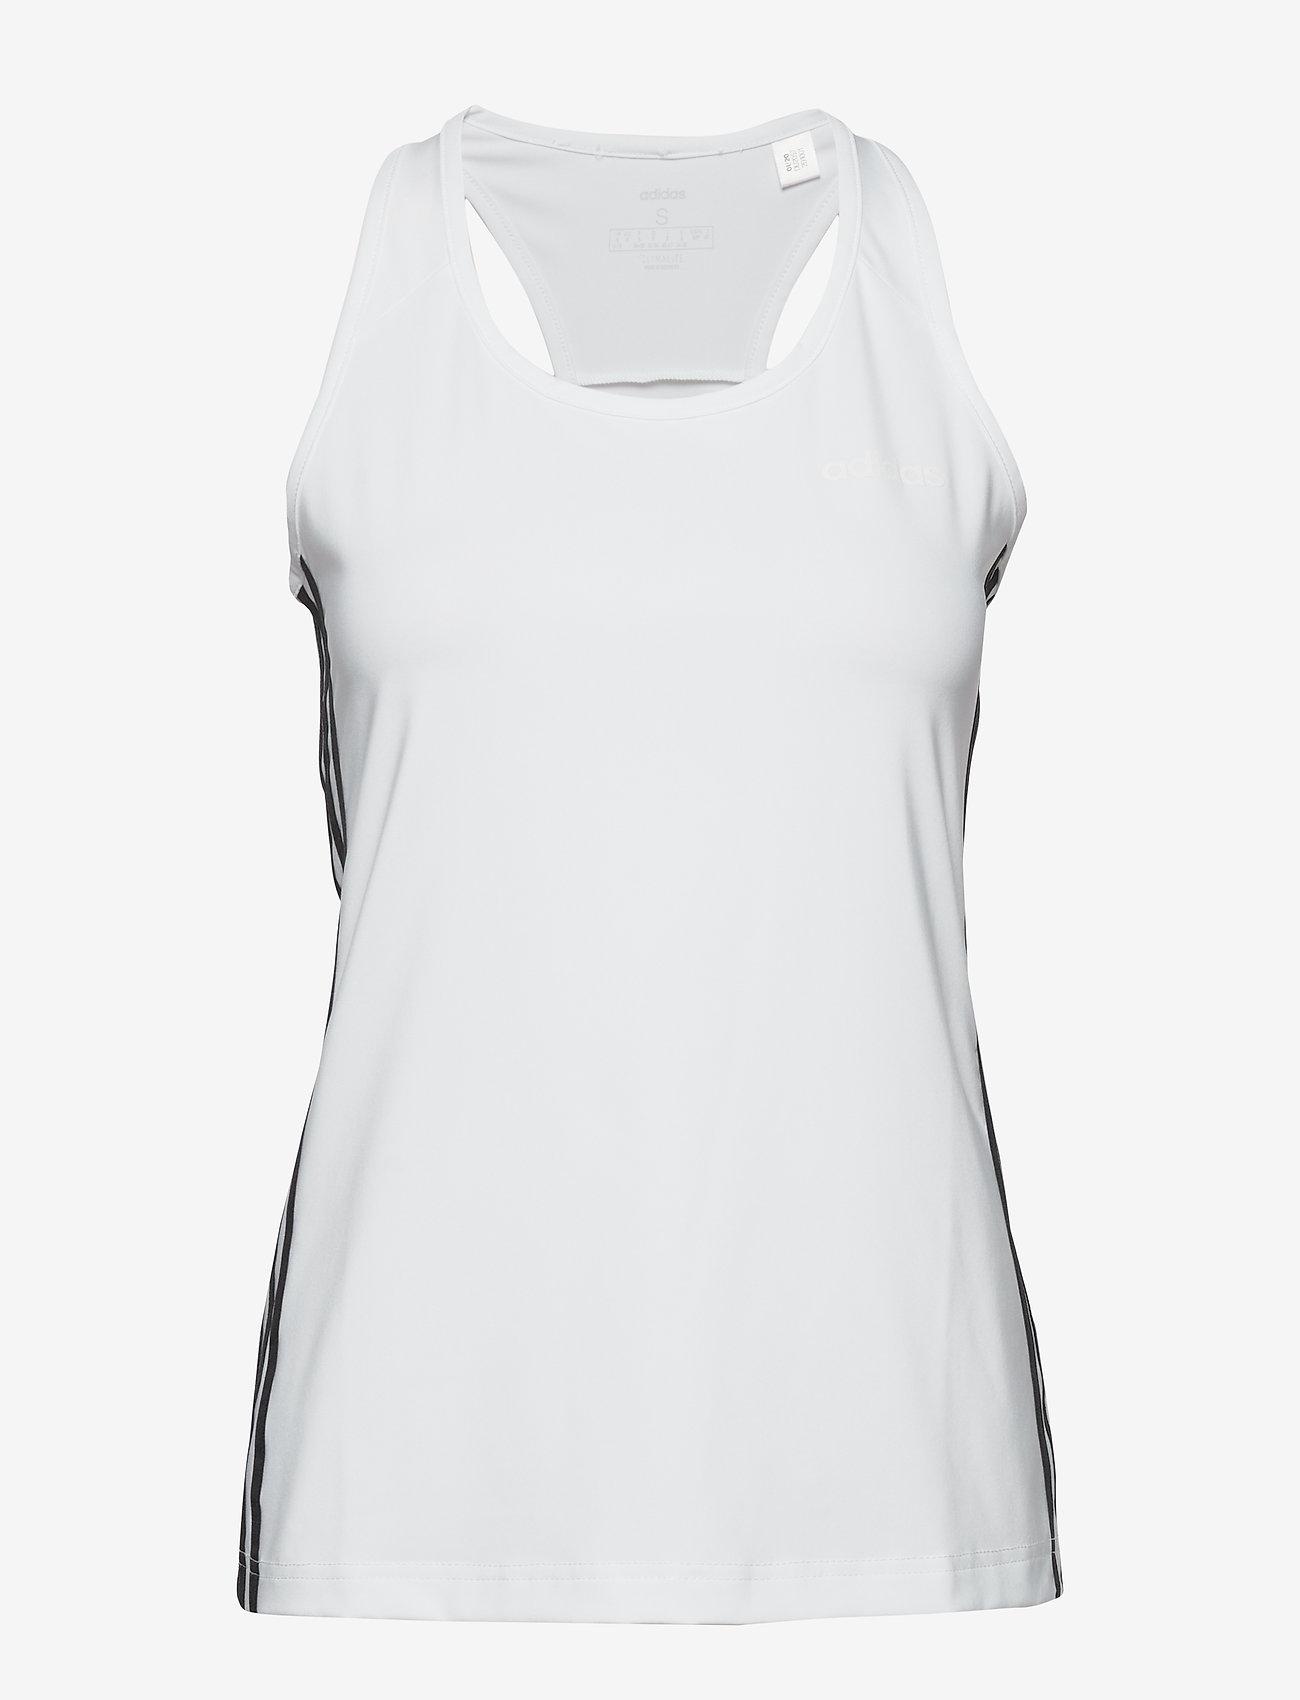 adidas Performance - Design 2 Move 3-Stripes Tank Top W - topjes - white/black - 1